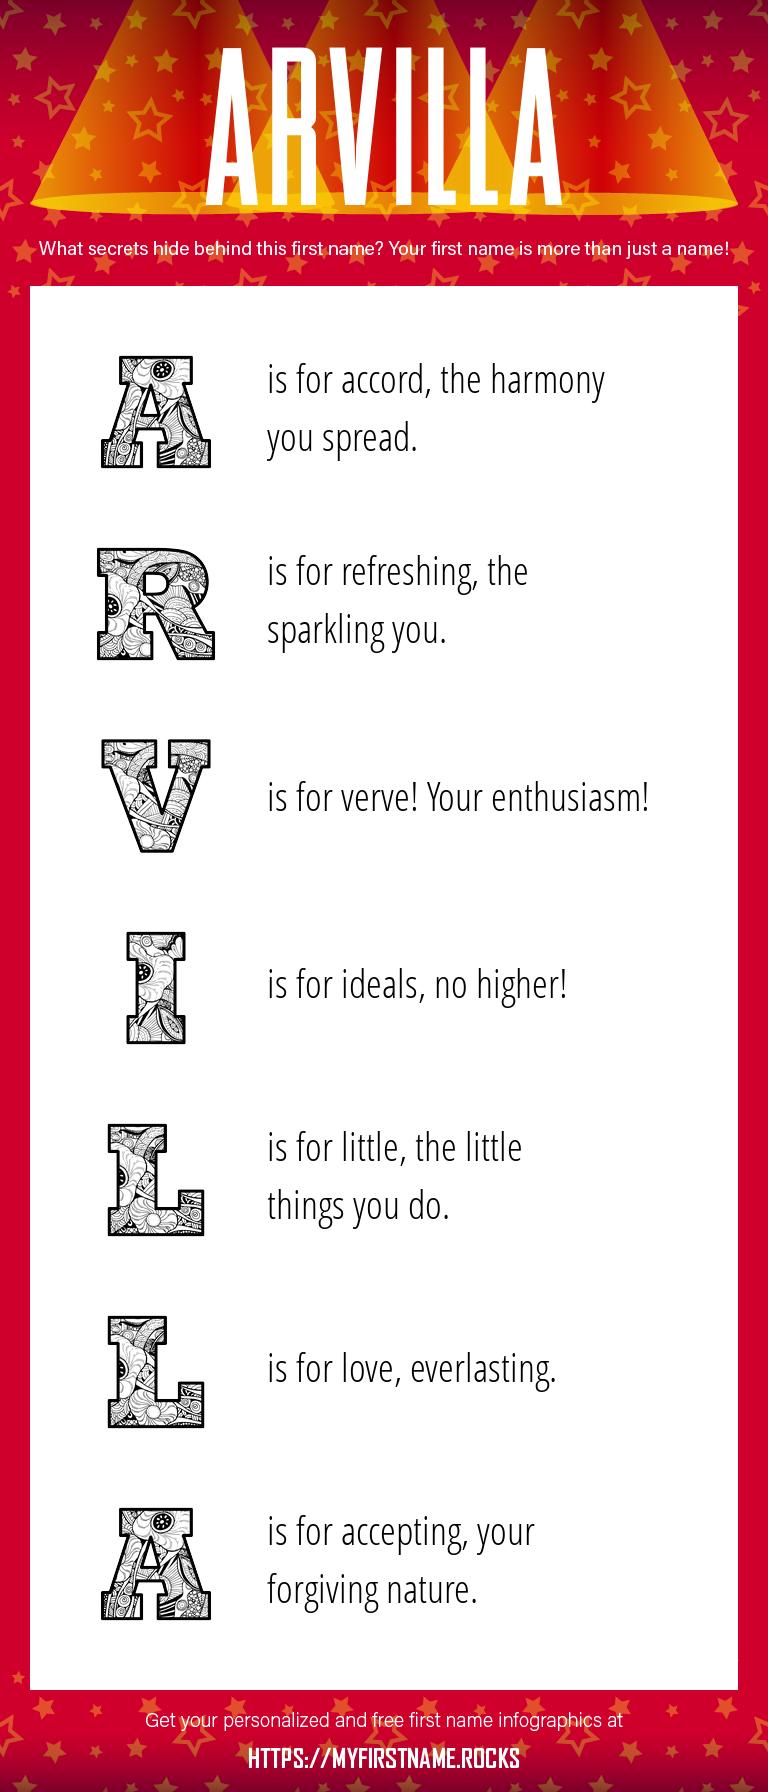 Arvilla Infographics